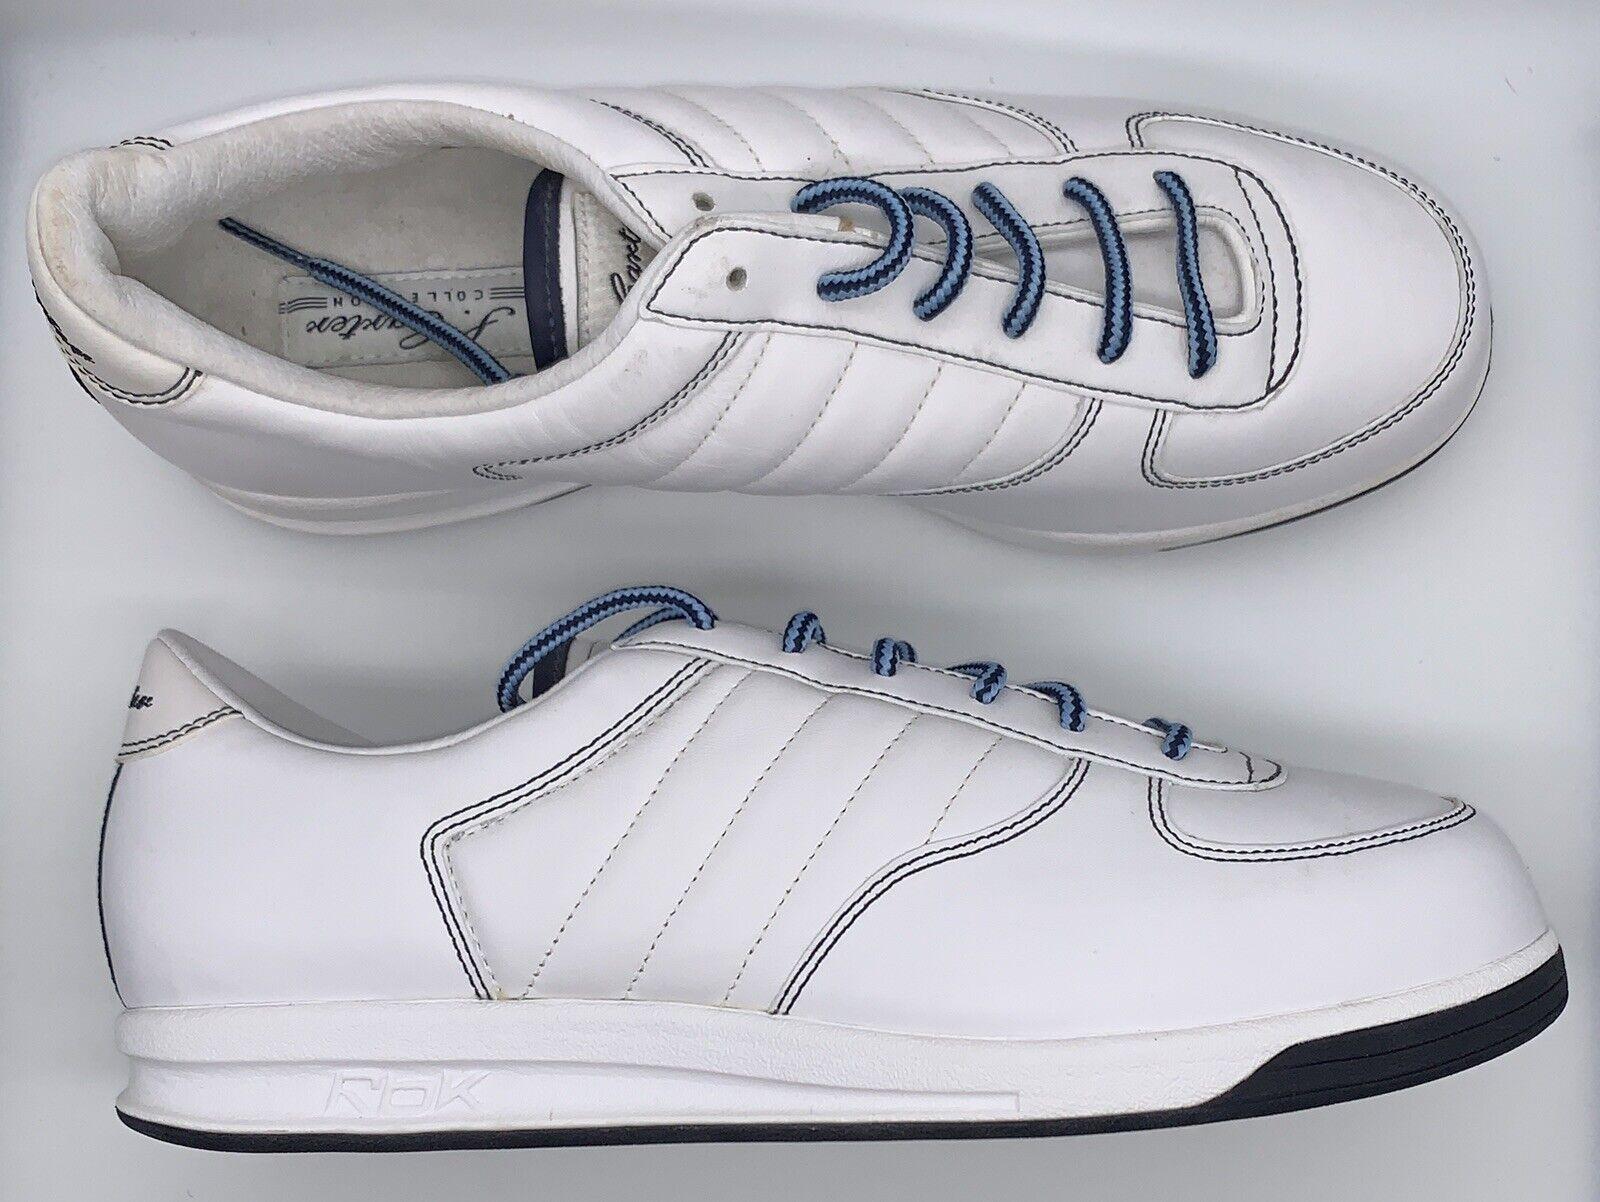 REEBOK RBK S. voitureTER Collection JAY Z Tennis Chaussures Blanc Bleu Etats-Unis Homme Taille 10.5 3